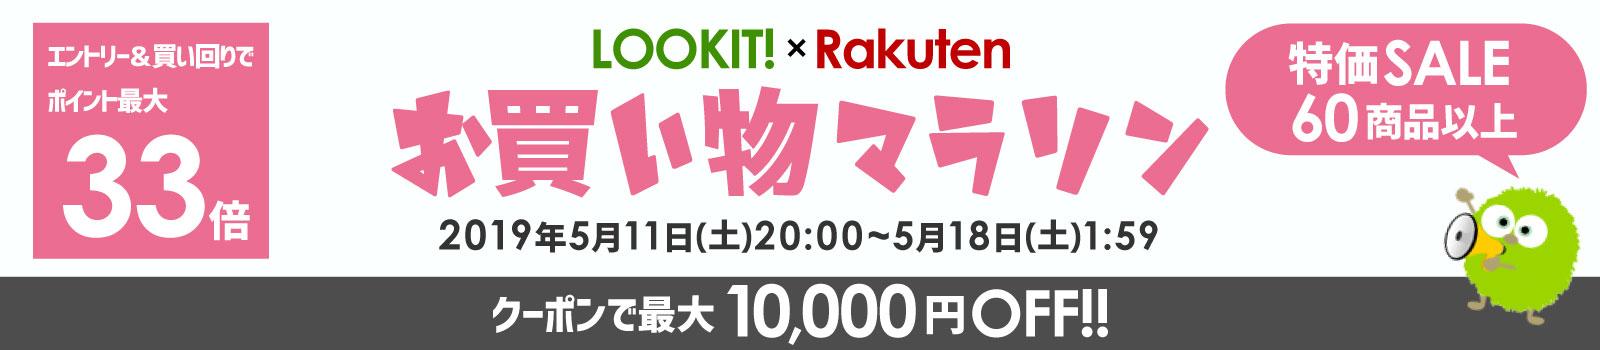 "LOOKIT!×楽天市場""お買い物マラソン"""